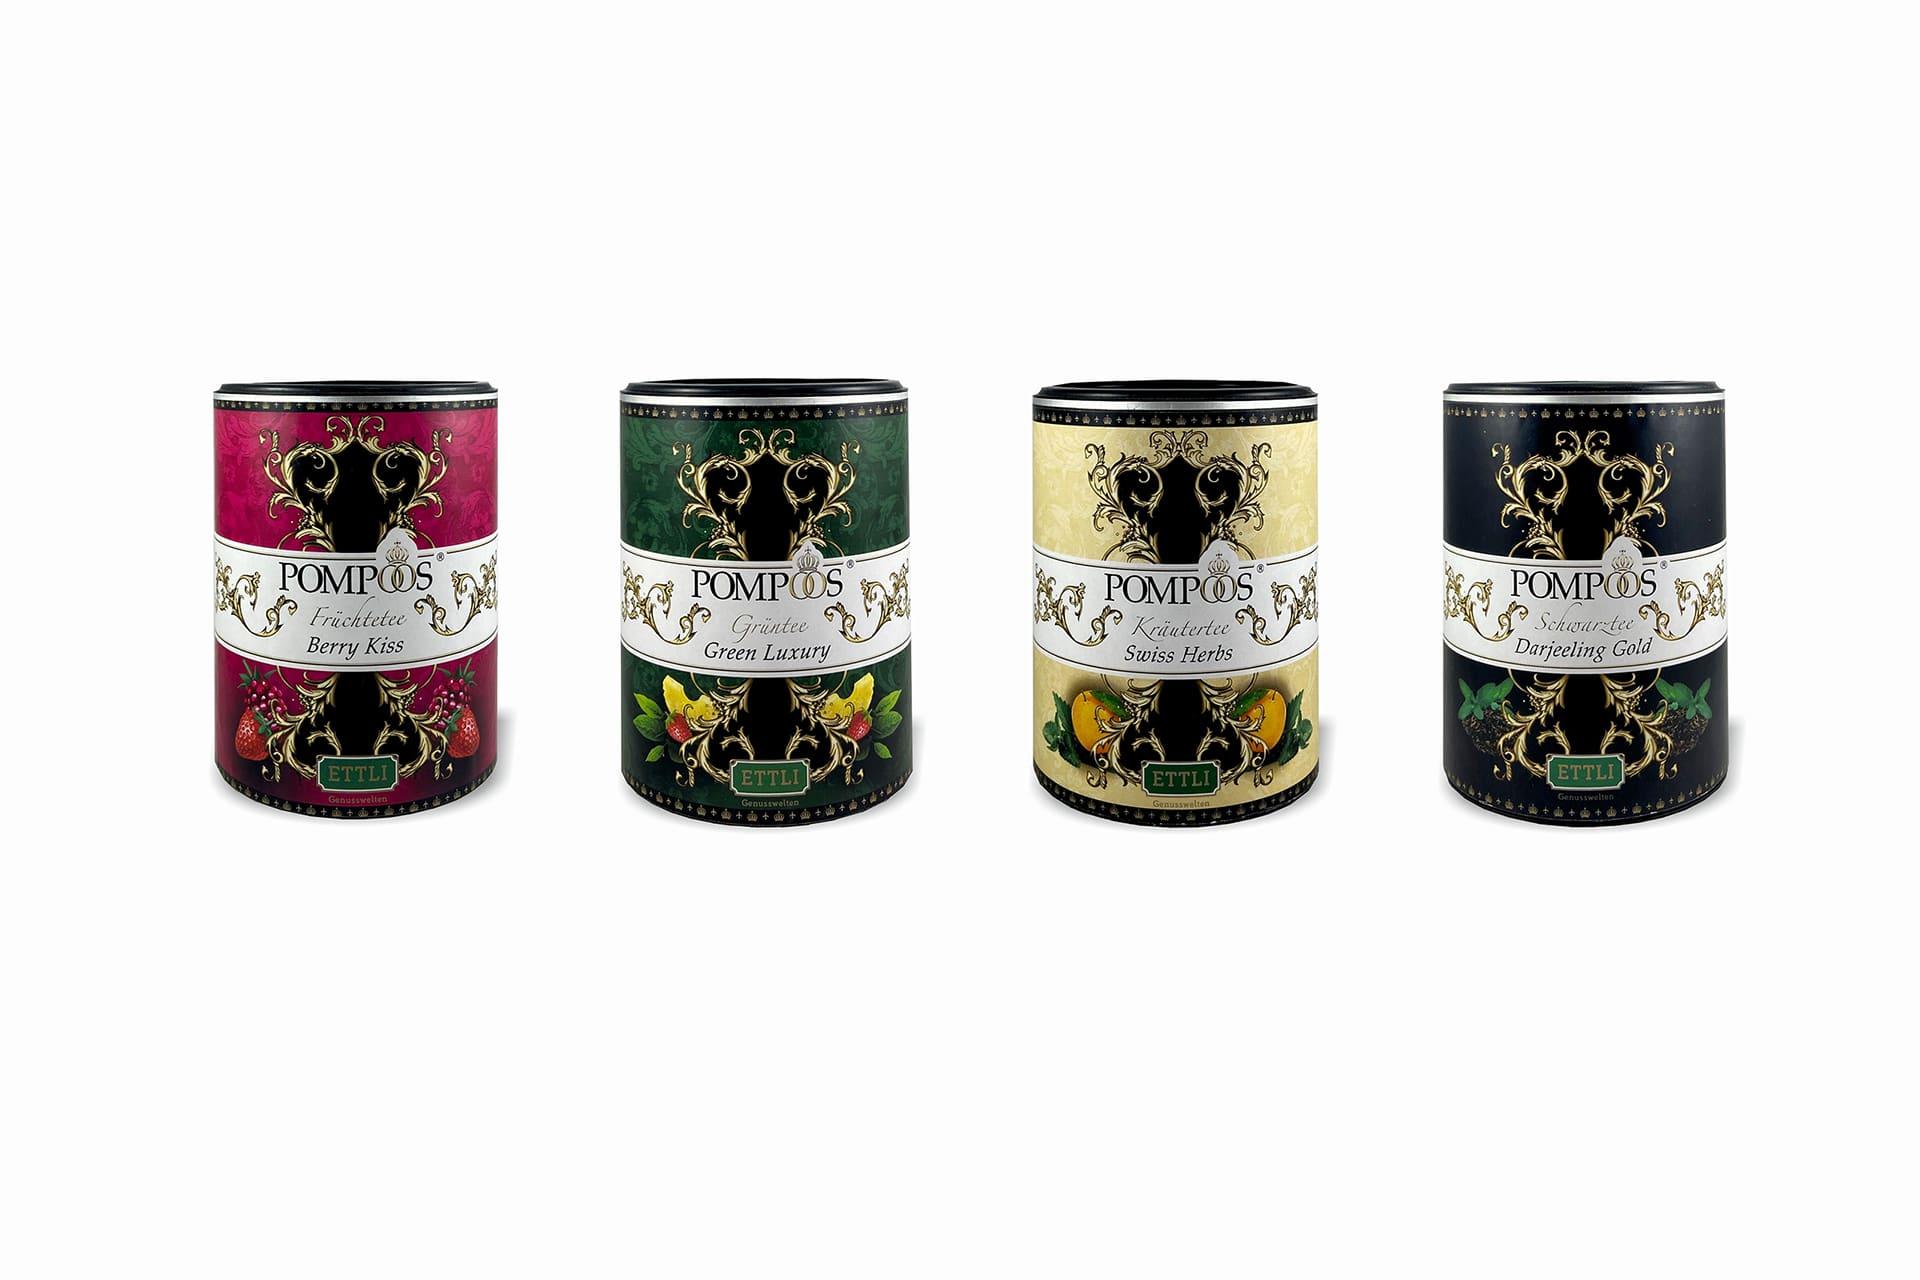 ETTLI entwickelt POMPÖÖS-Teekollektion für HARALD GLÖÖCKLER